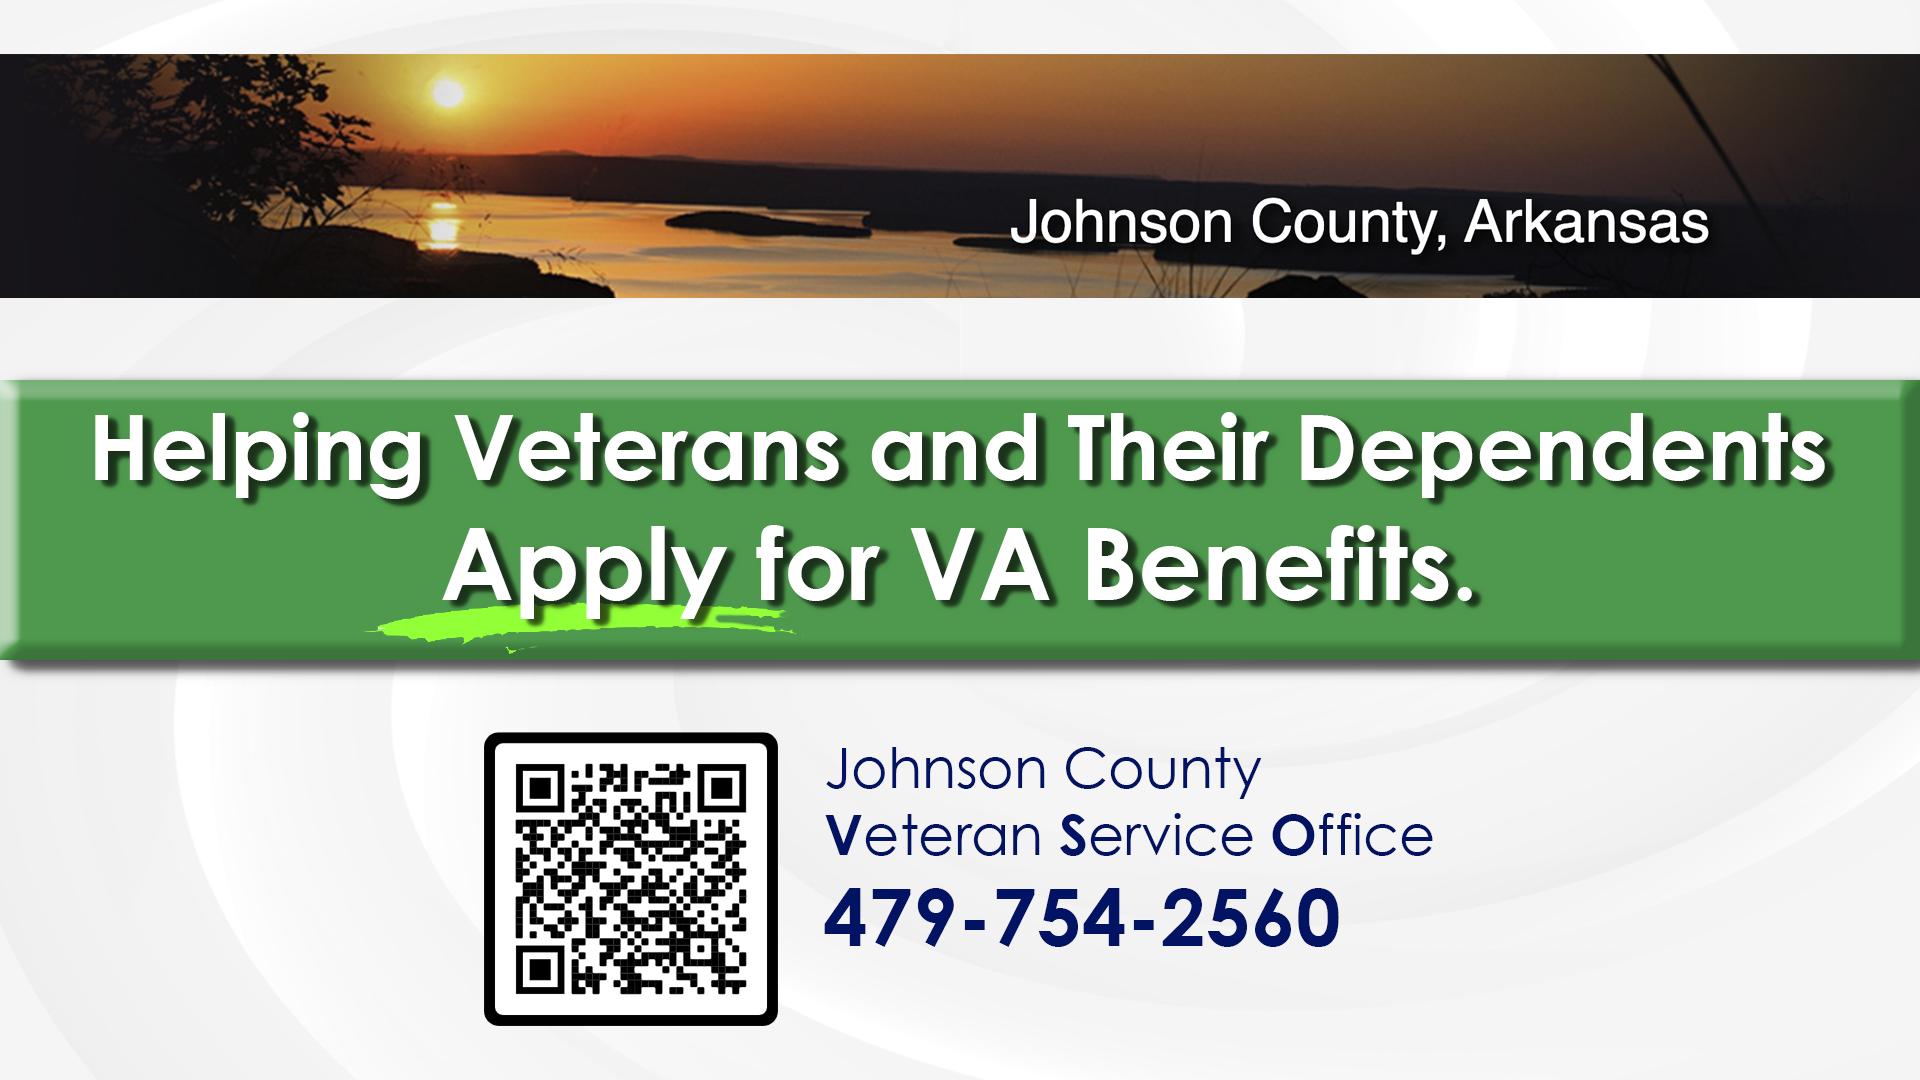 Veteran services - Johnson